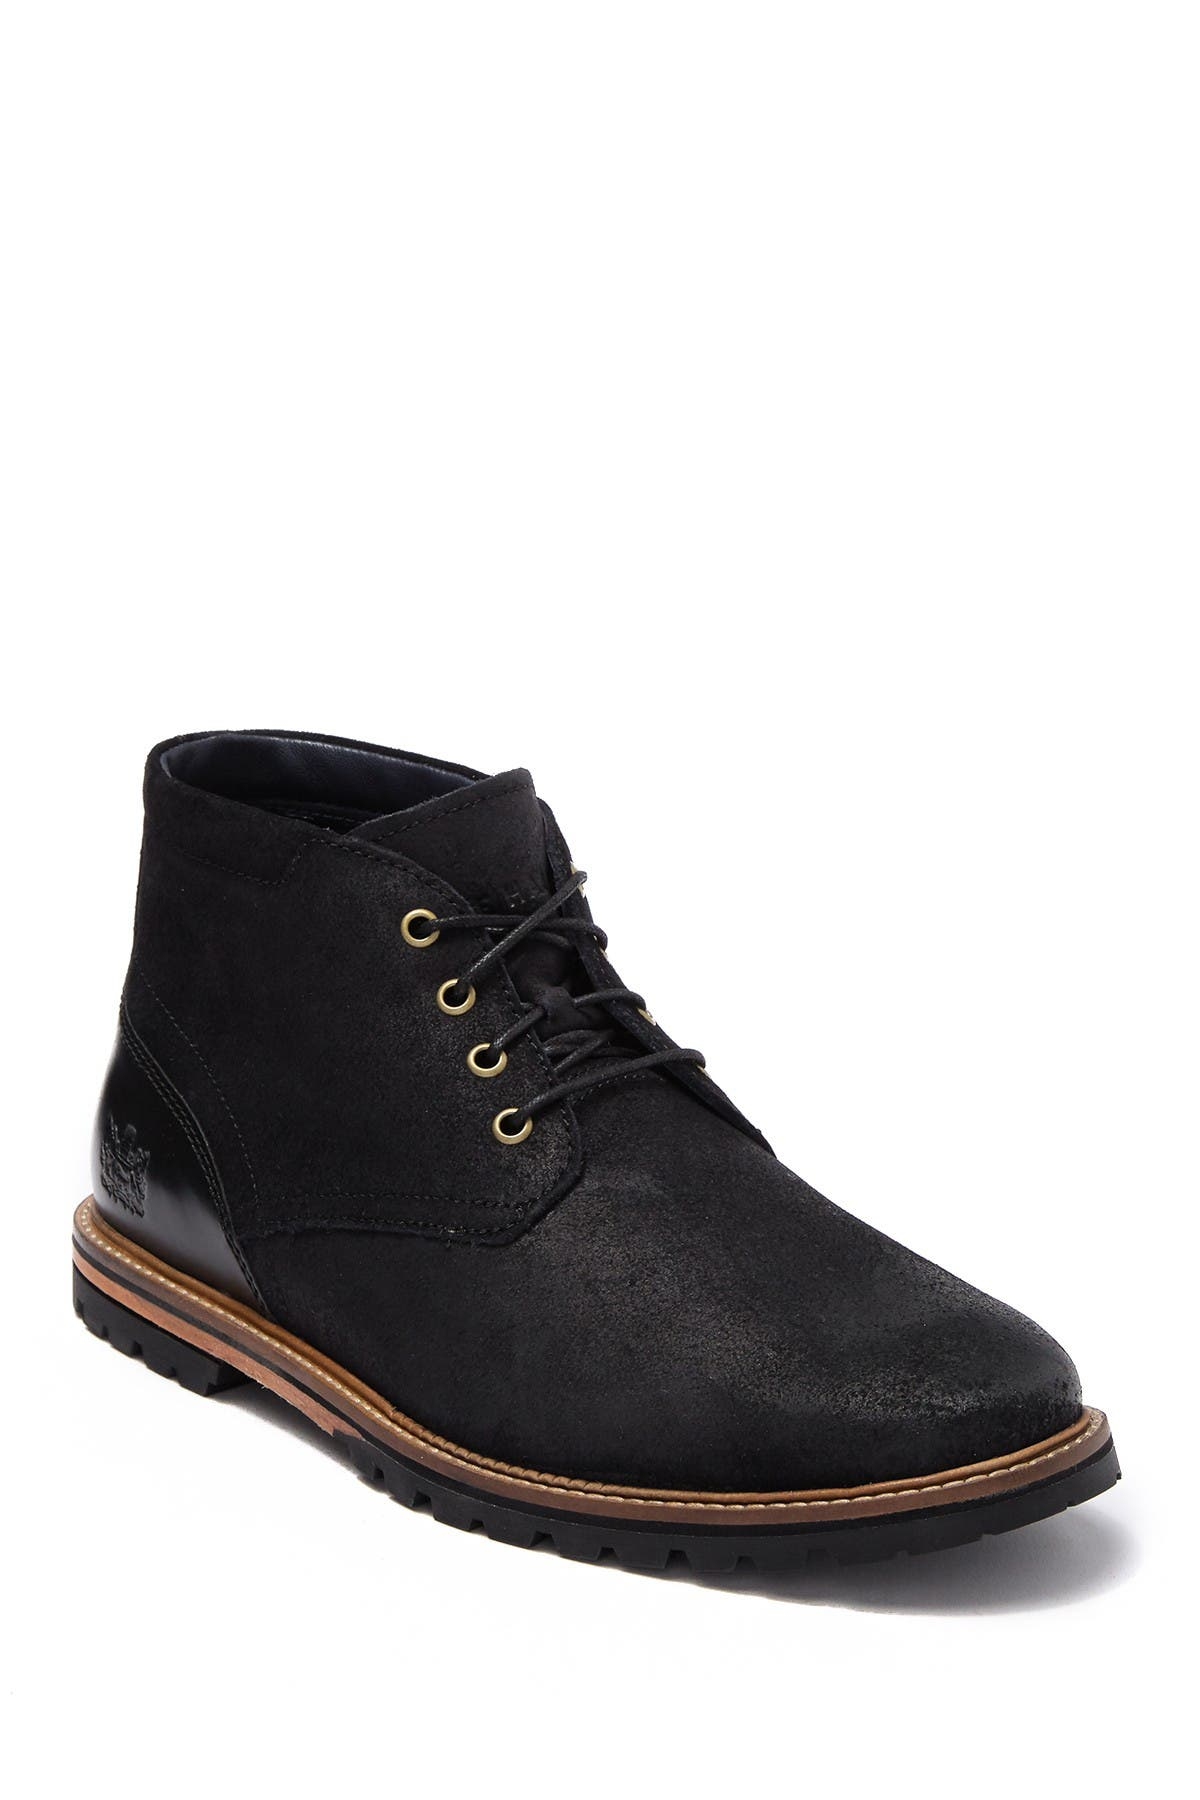 Raymond Grand Leather Chukka Boot